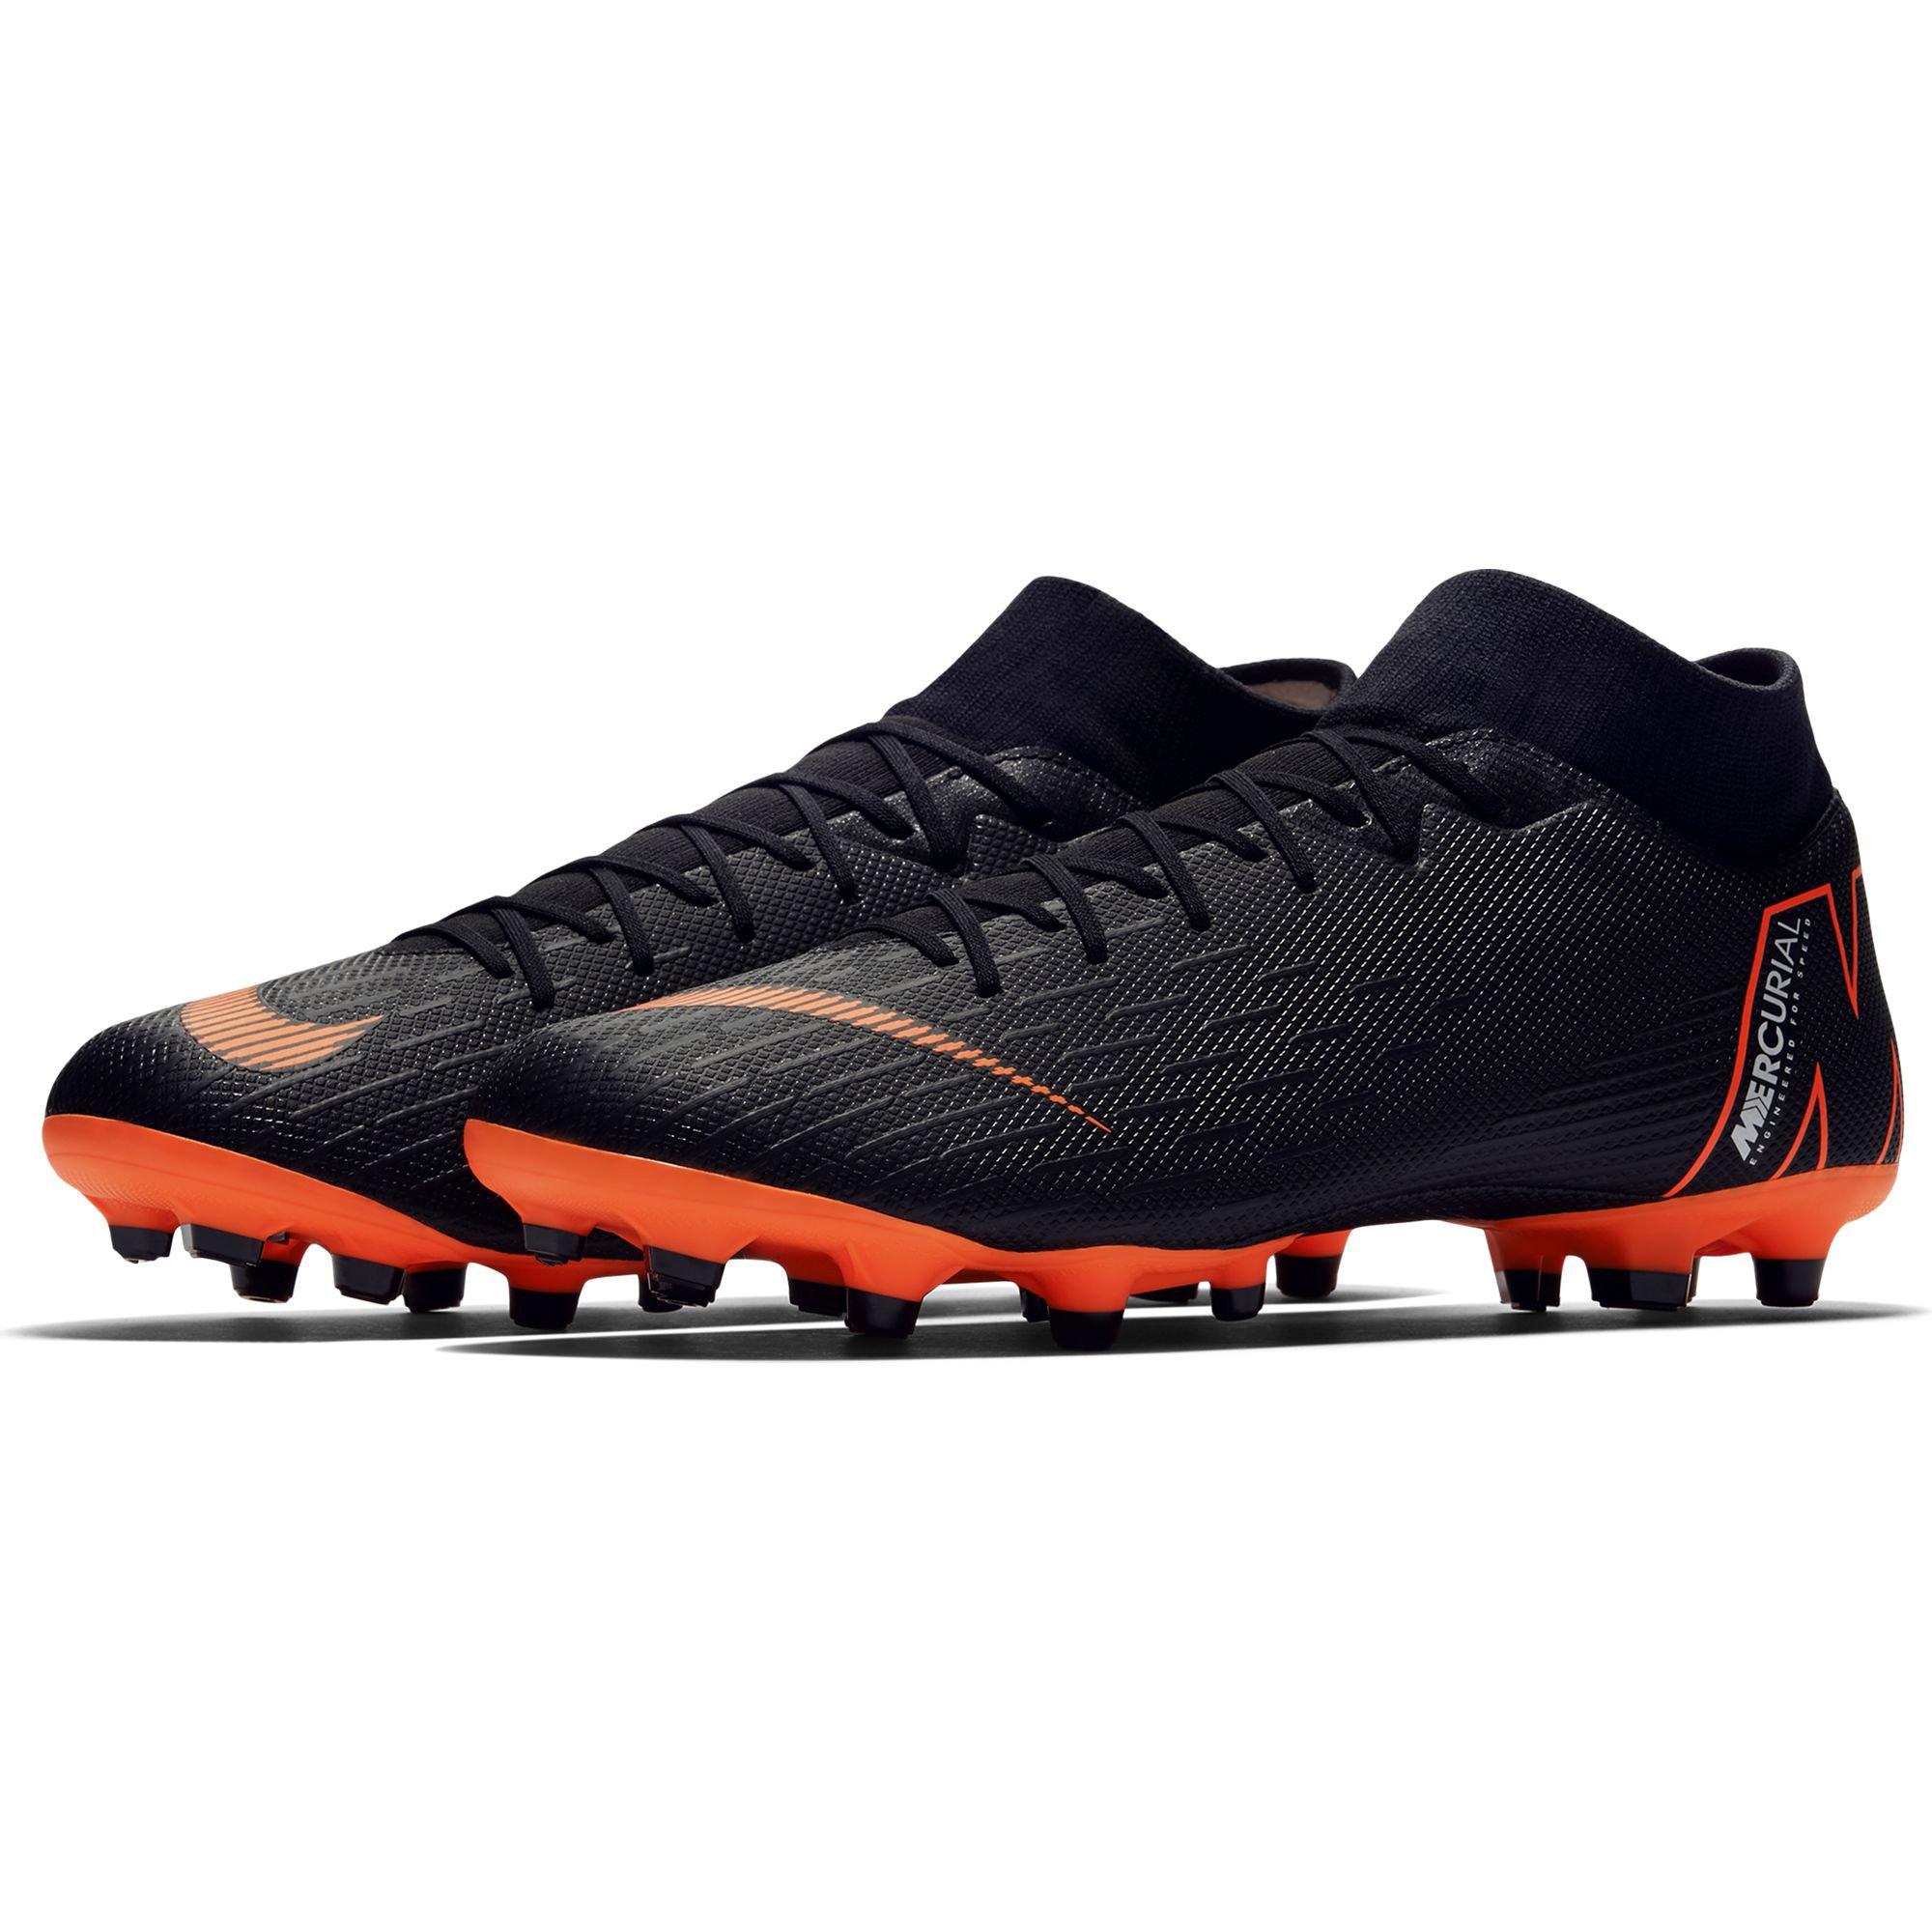 nike mercurial super vi - fest, akademie - boden fußball fest, - schwarz, orange insgesamt 62fe16